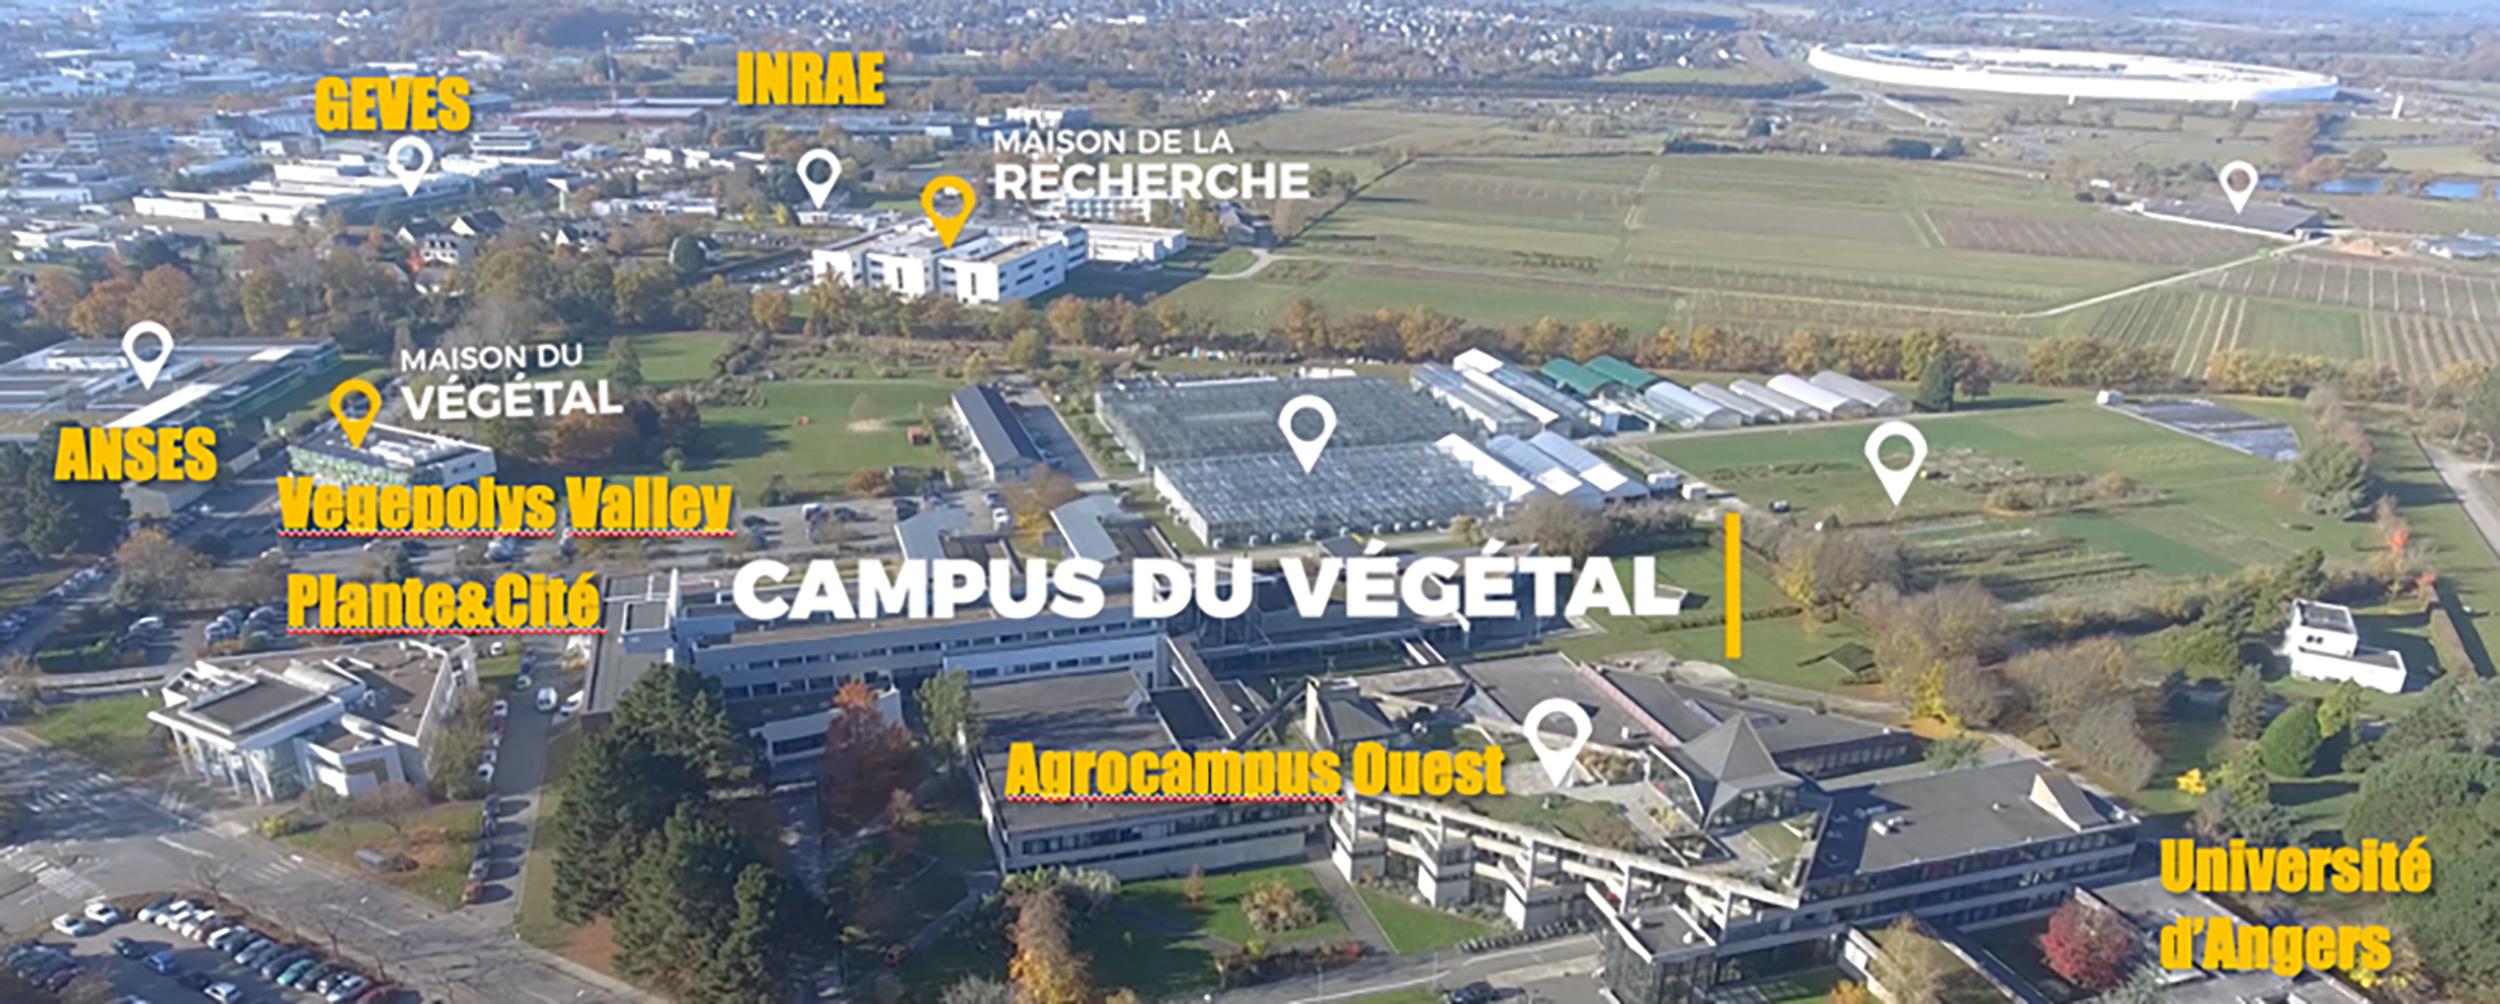 Campus du Végétal angevin